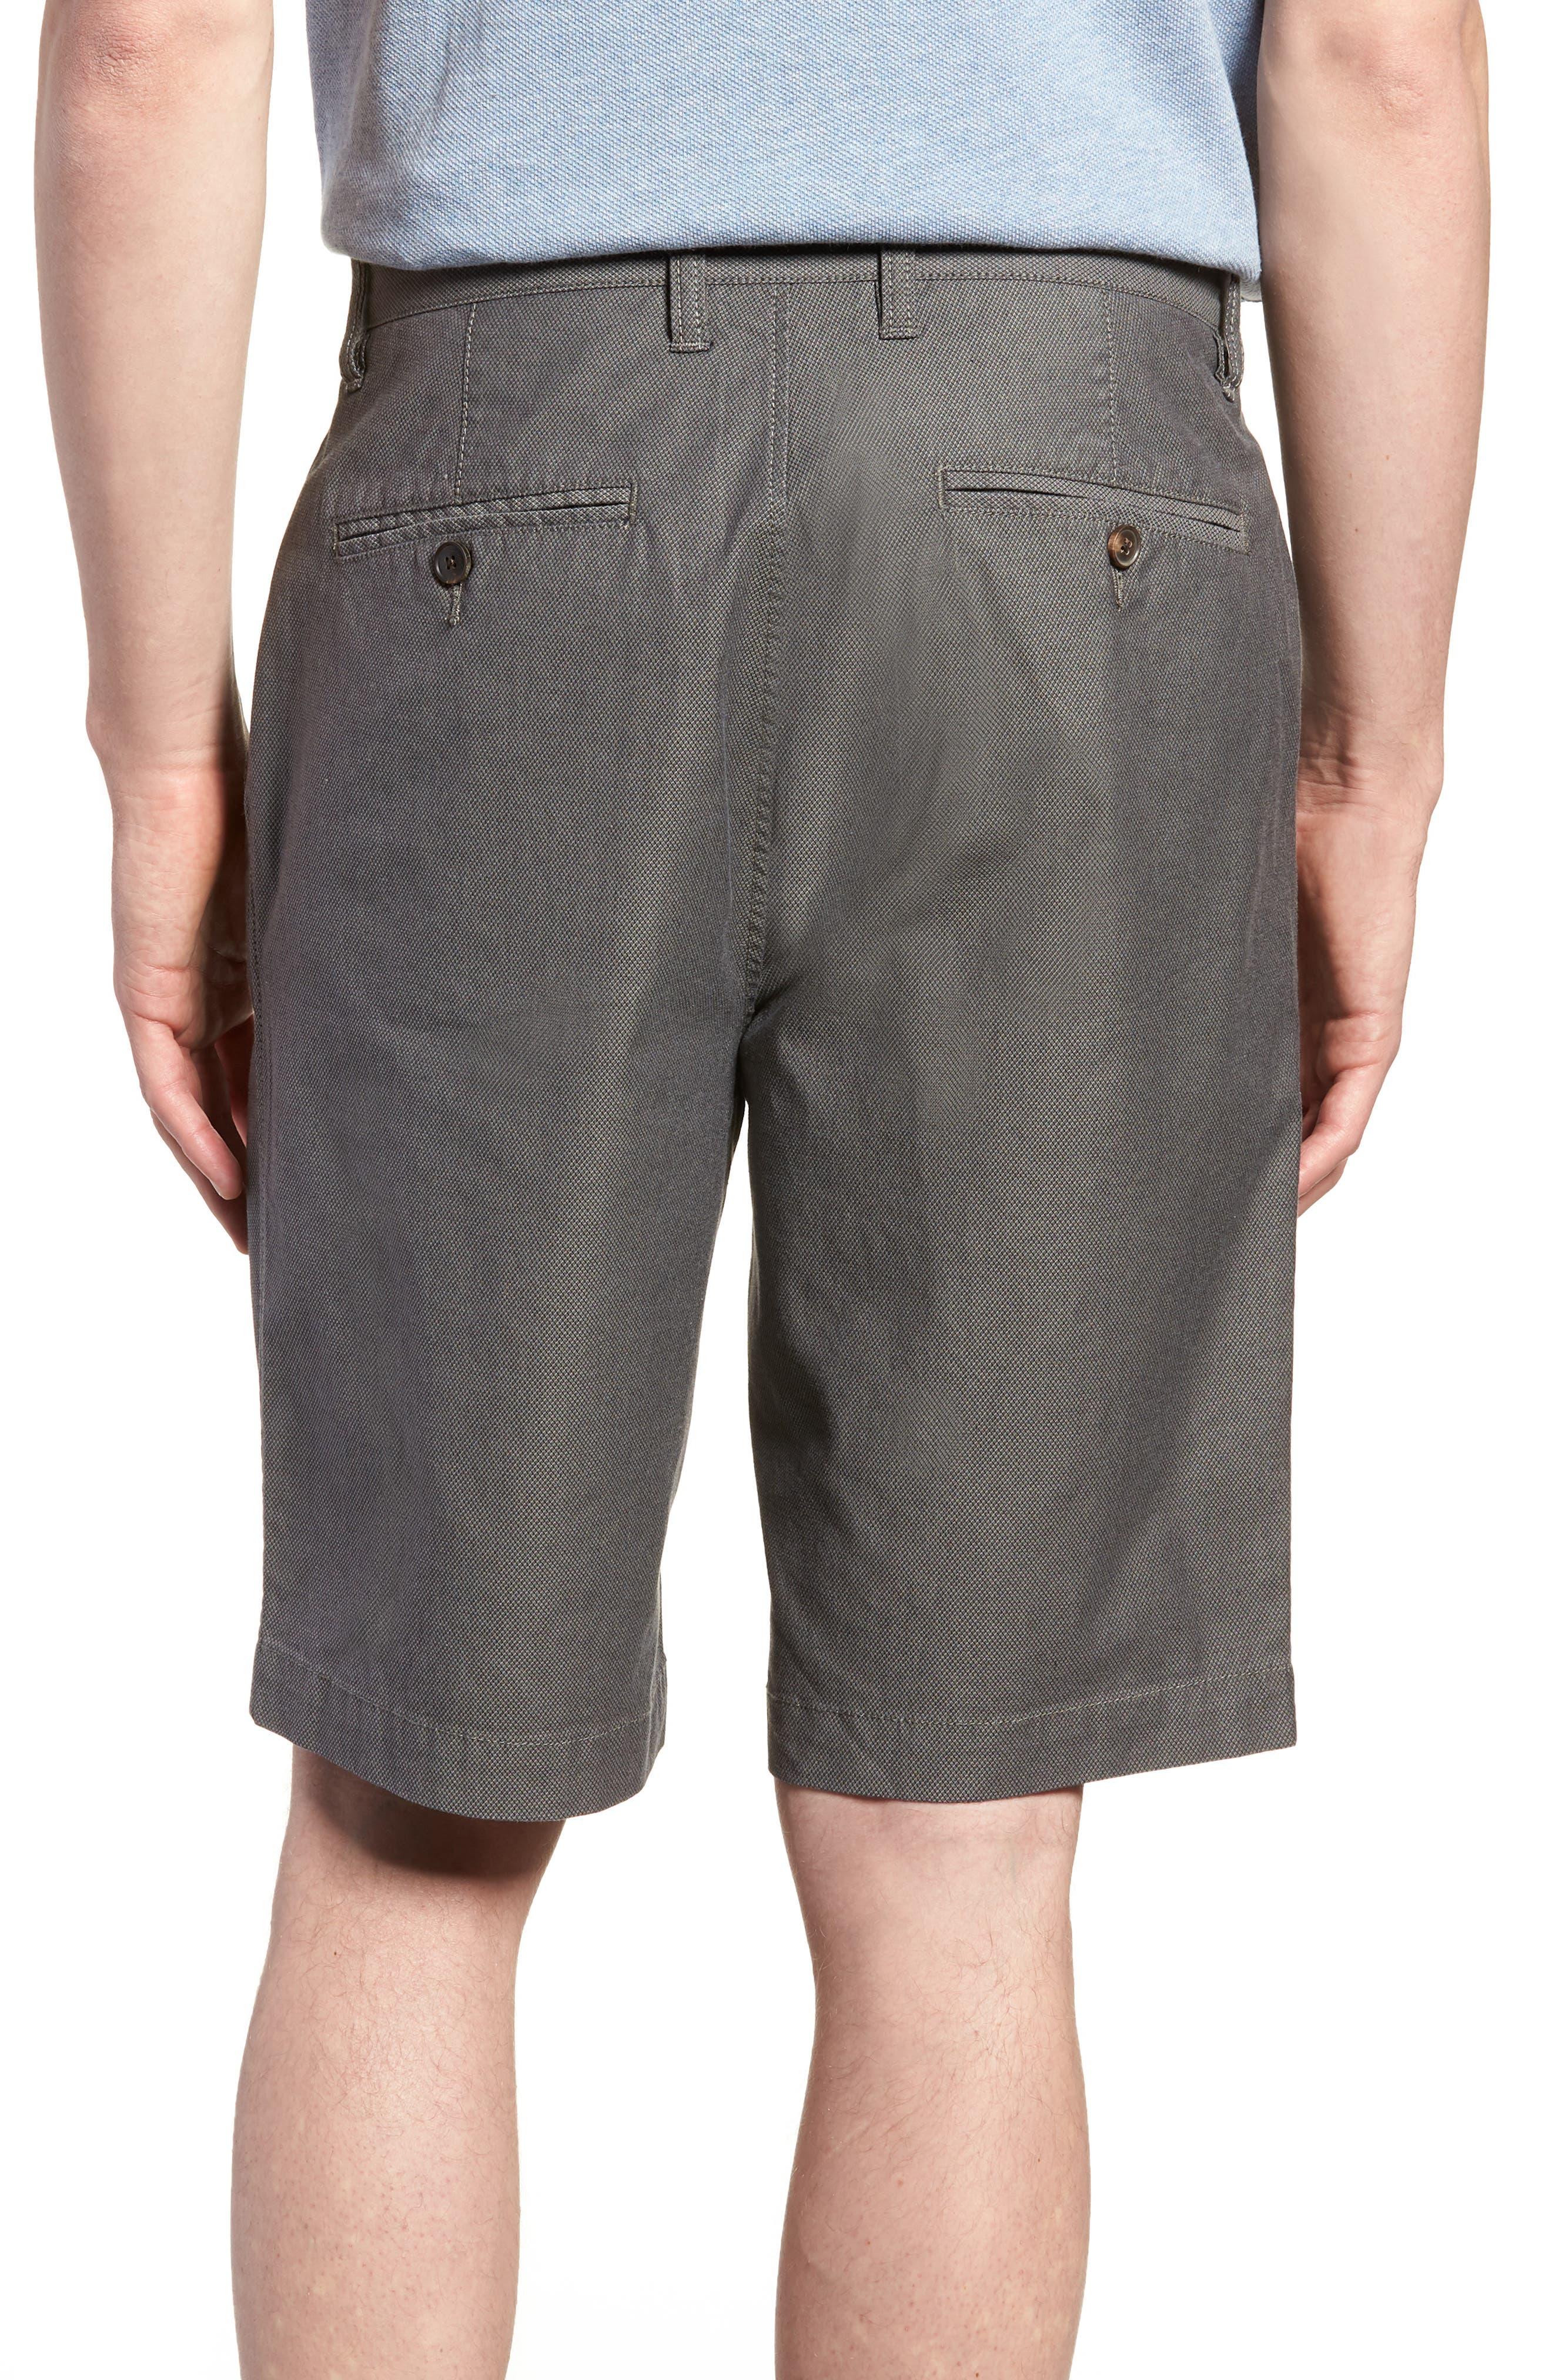 Army Bay Regular Fit Shorts,                             Alternate thumbnail 2, color,                             Granite